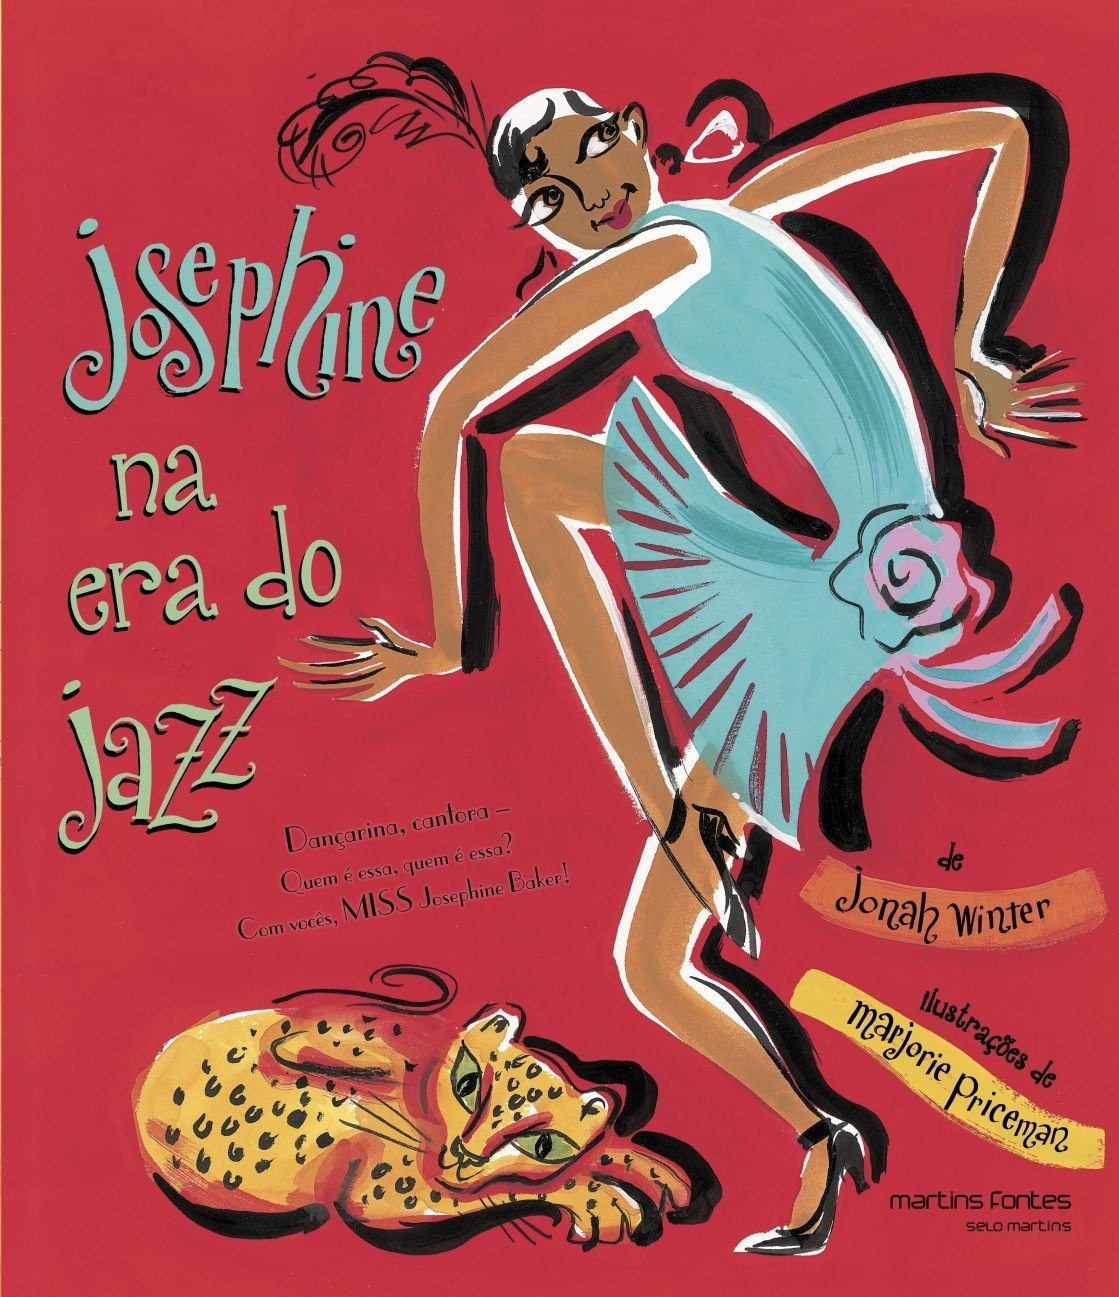 Josephine na Era do Jazz (Em Portuguese do Brasil) pdf